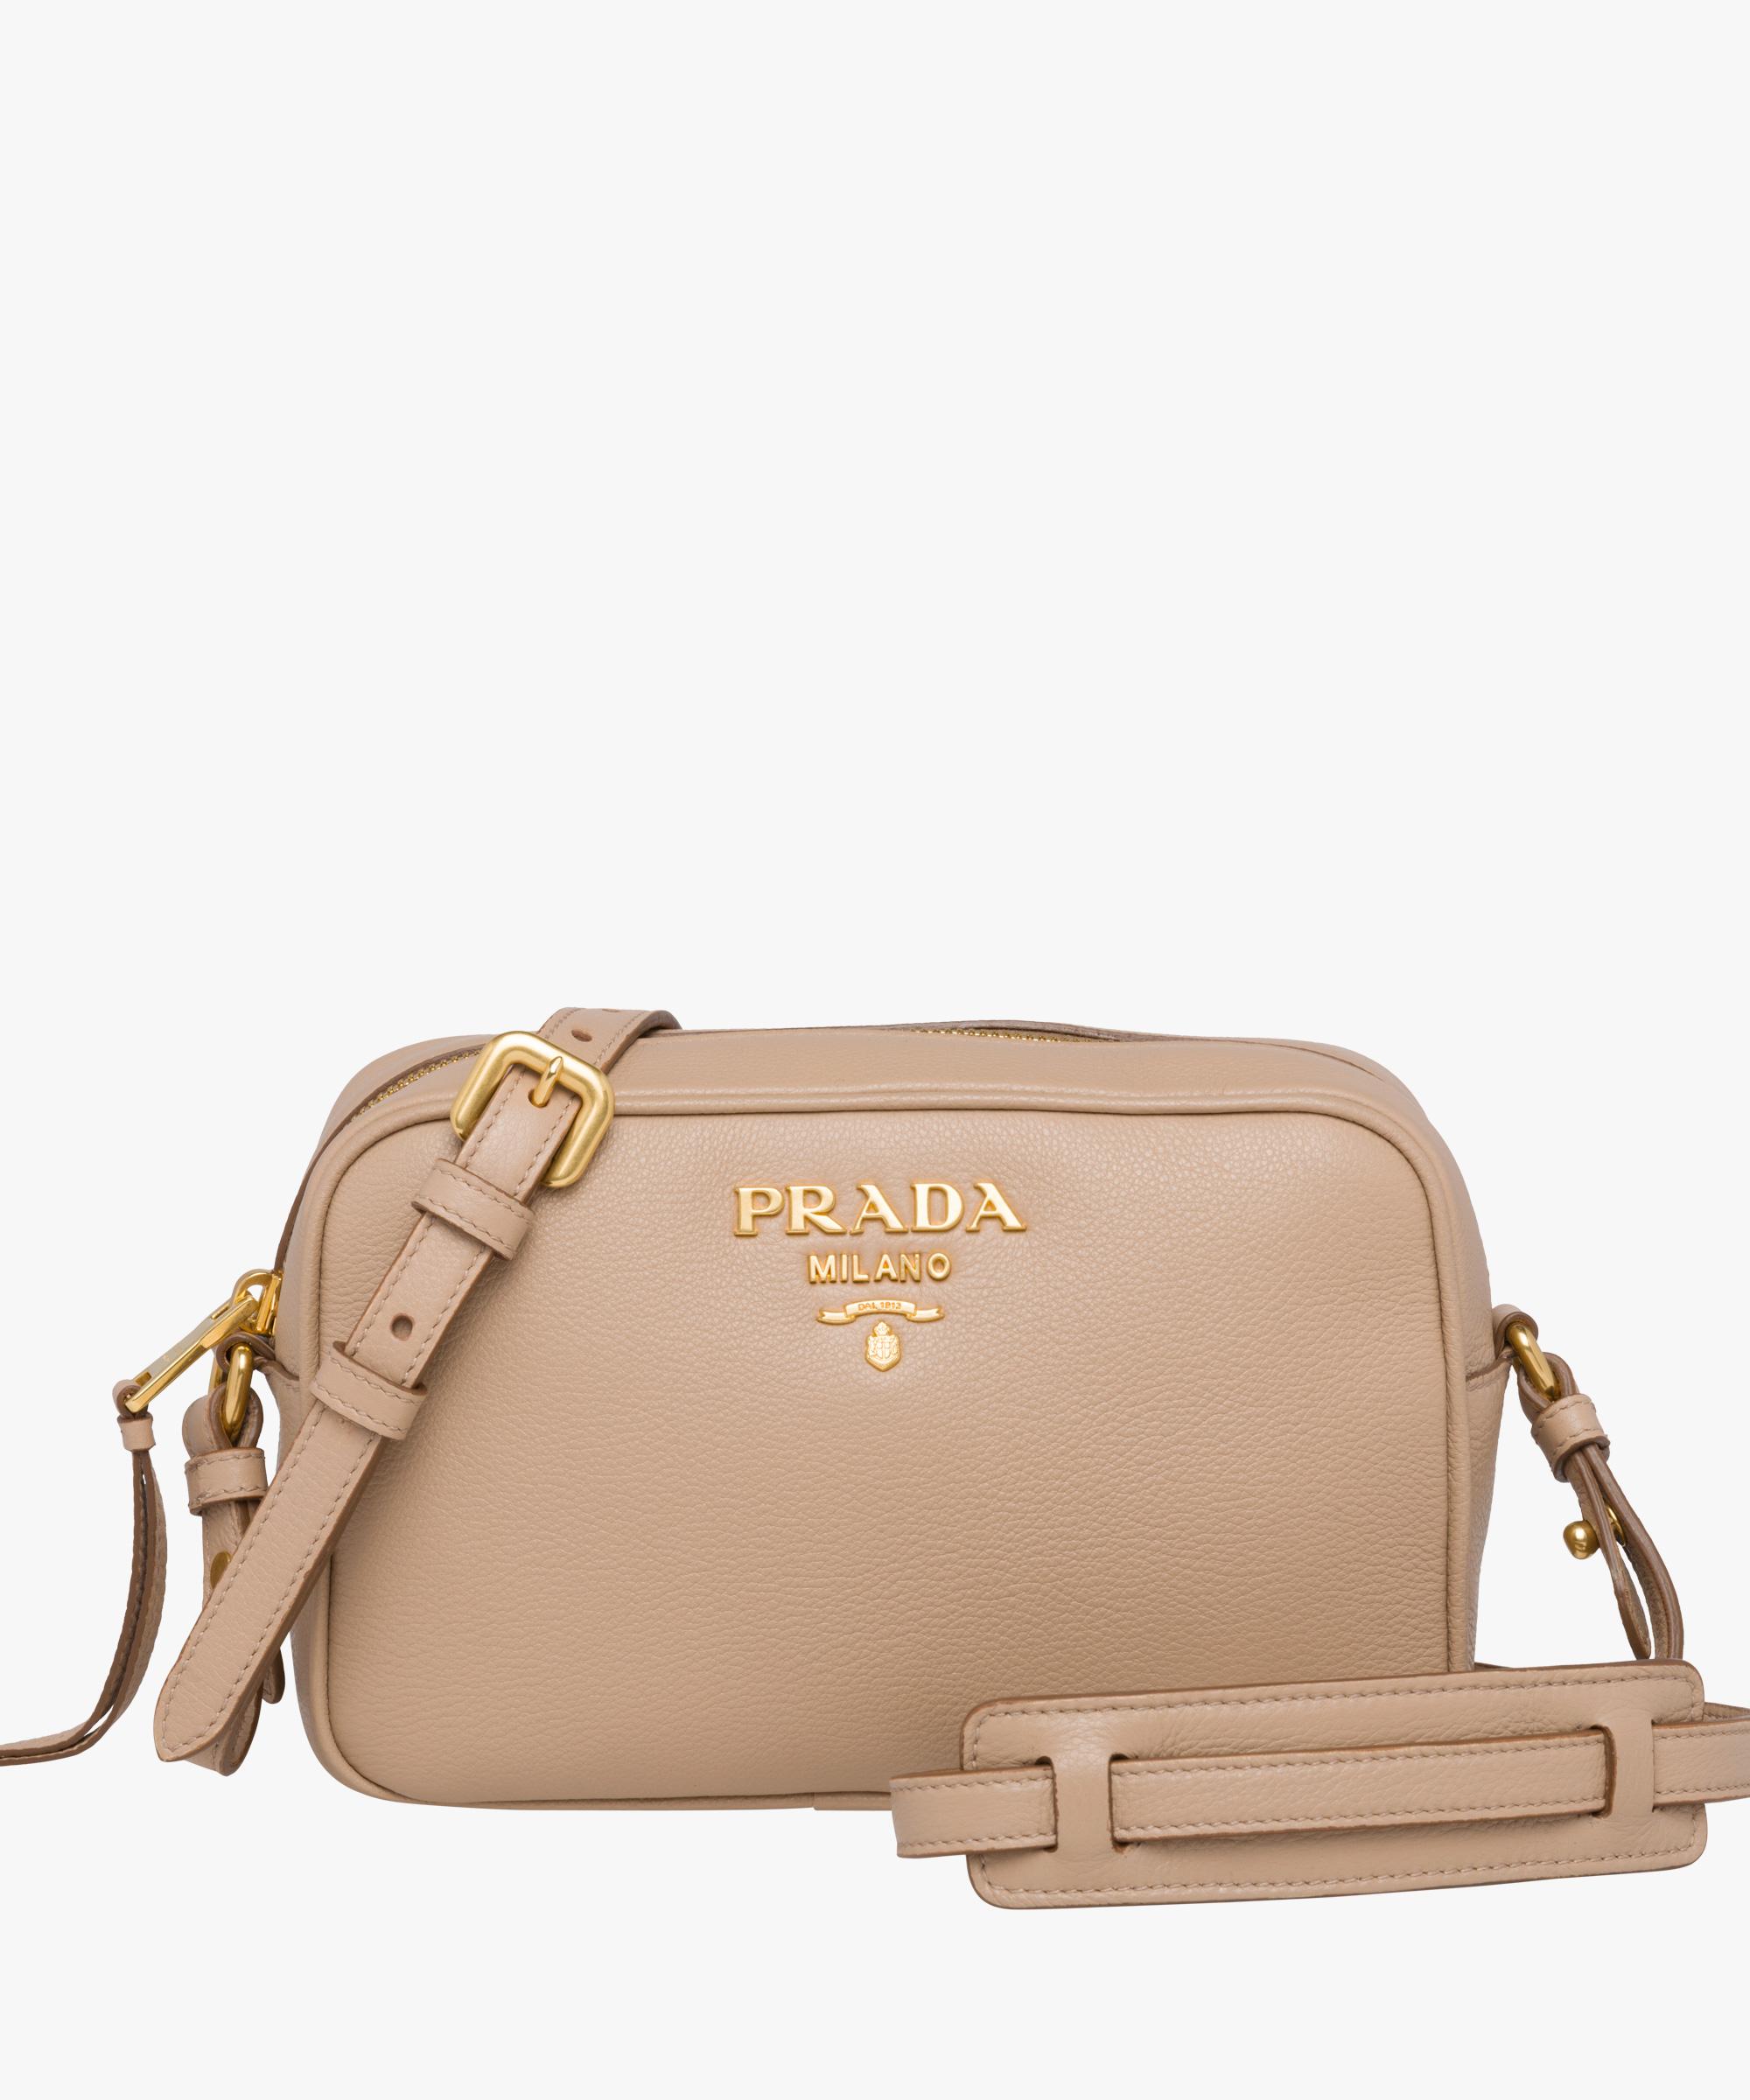 ... Leather shoulder bag Prada CAMEO BEIGE ... f0c5b6c0031d4